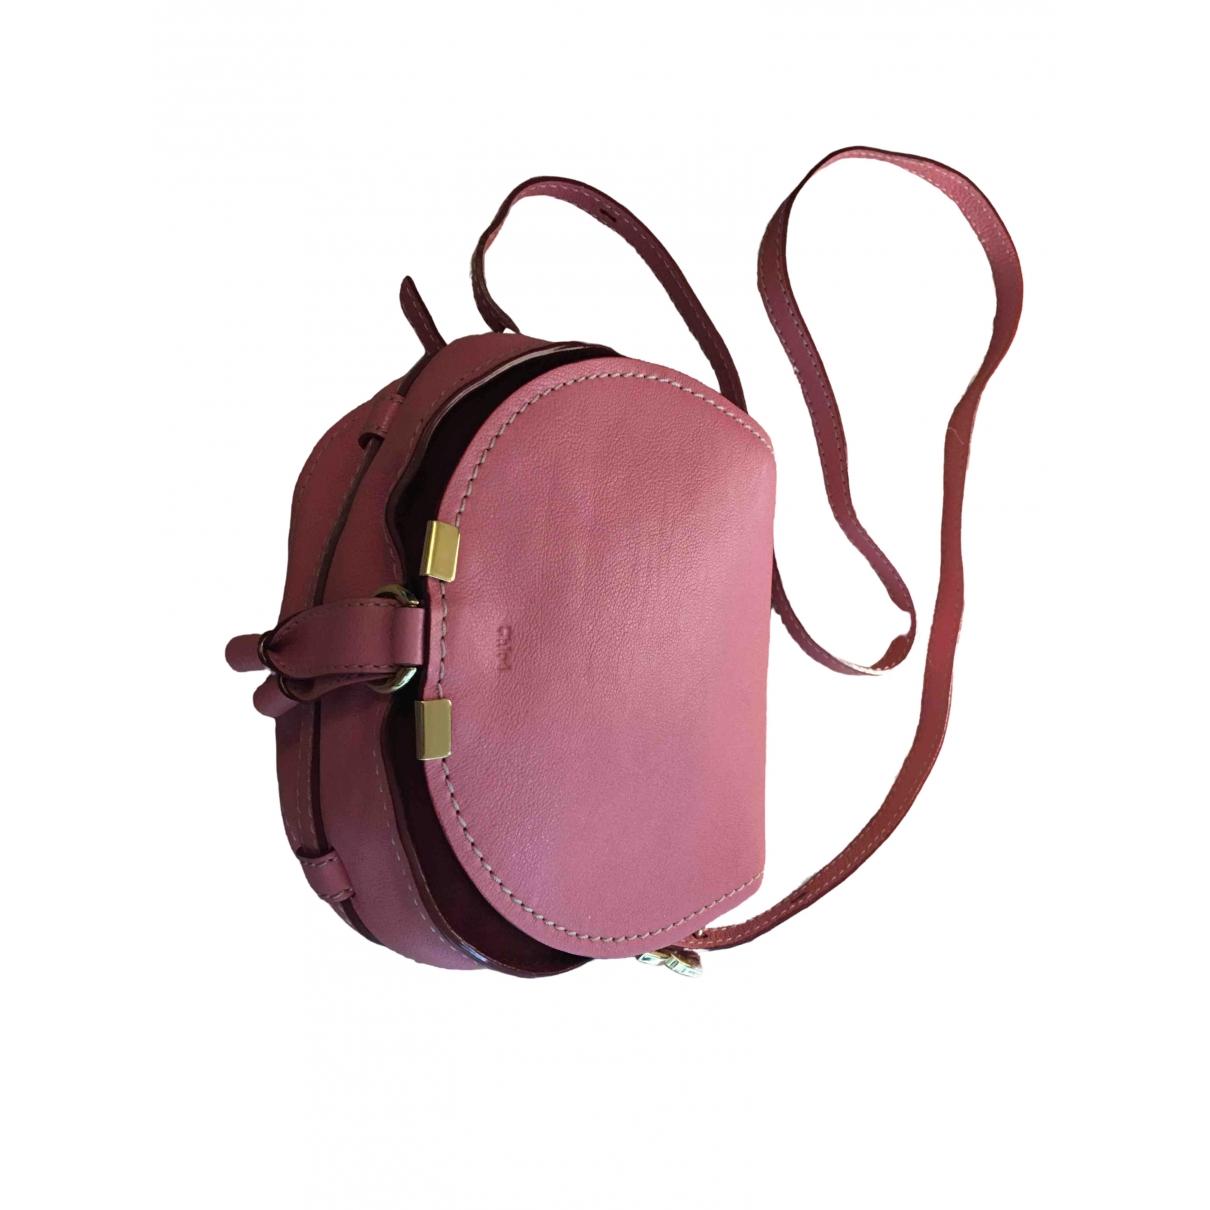 Chloé \N Pink Leather handbag for Women \N